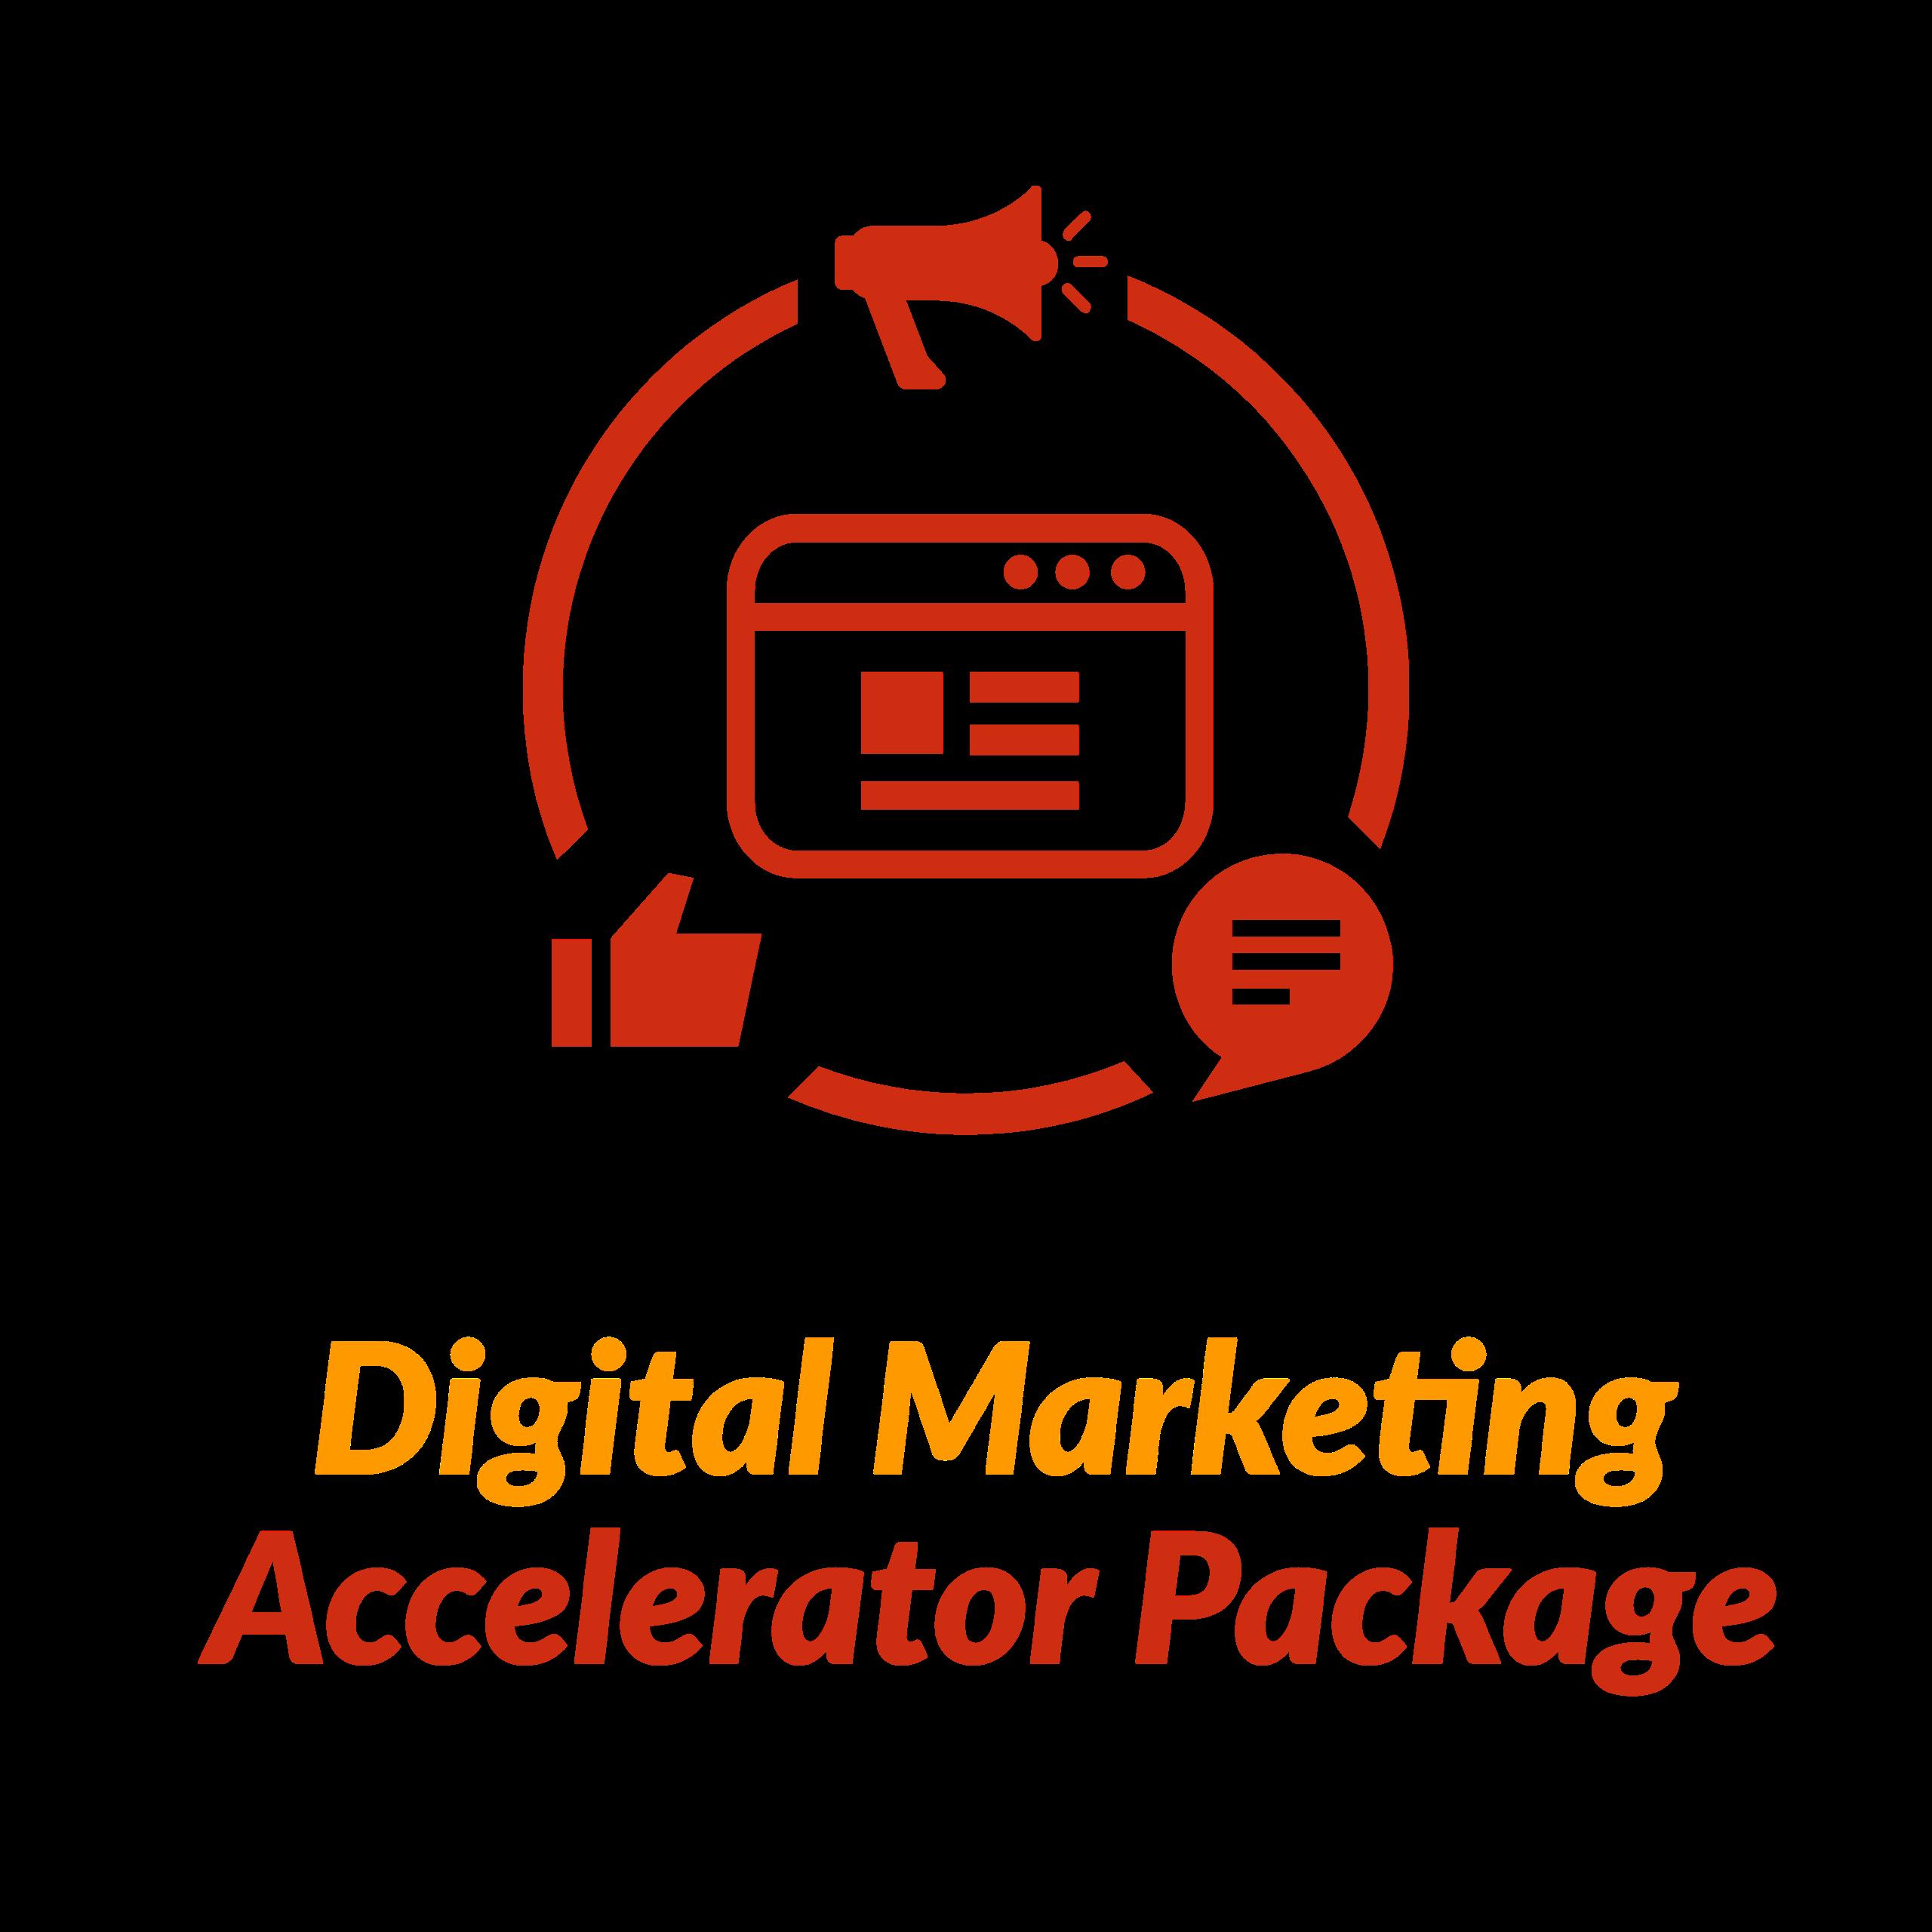 Digital Marketing Accelerator Package